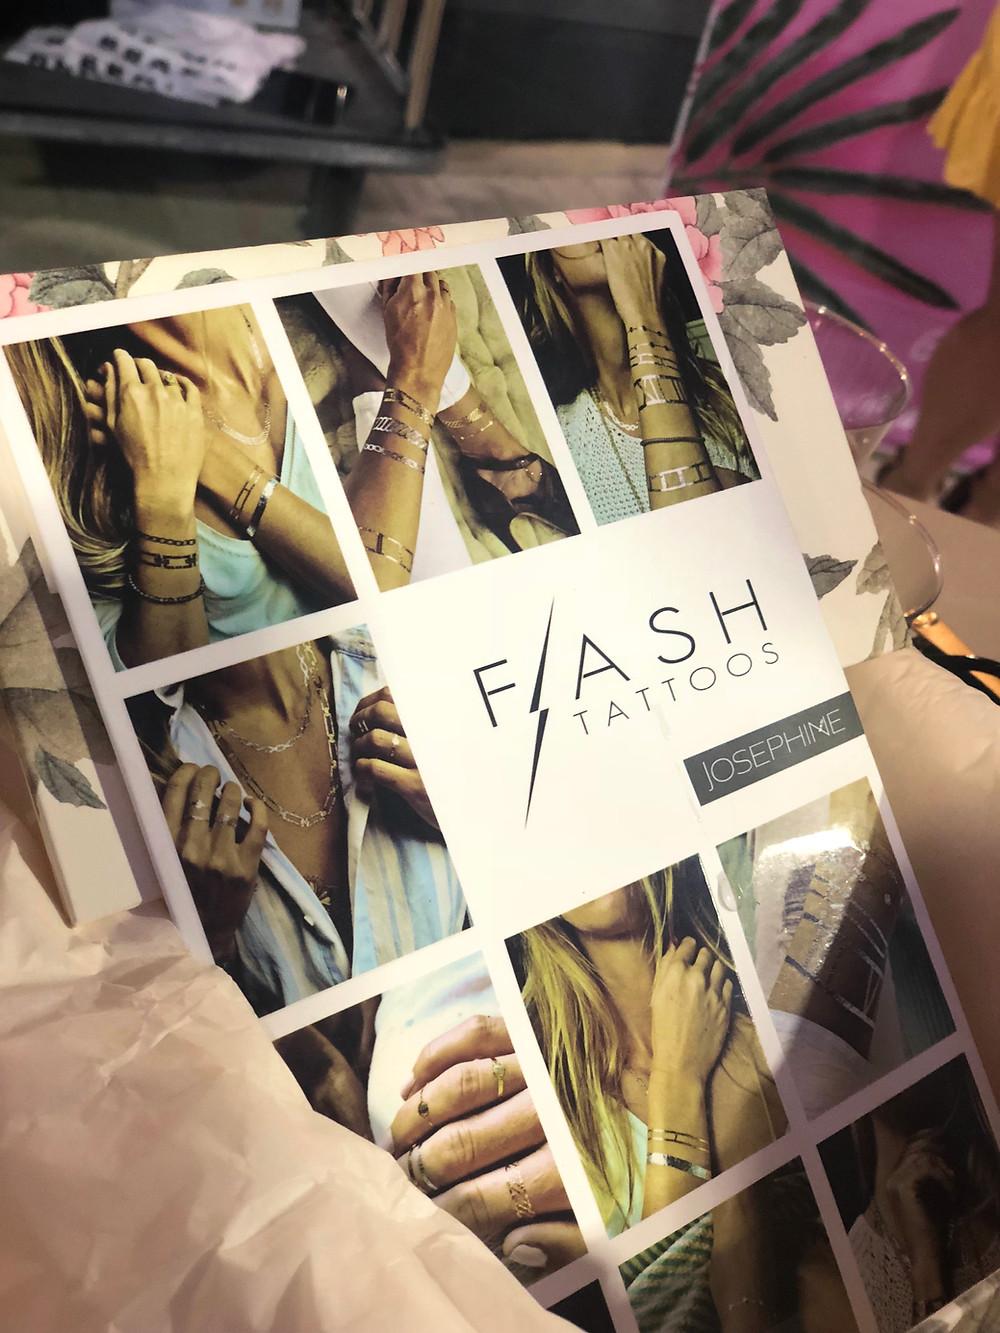 Flash-Tattoos-Sponsor-of-Sipandmingle-Florida-Influencer-Conference